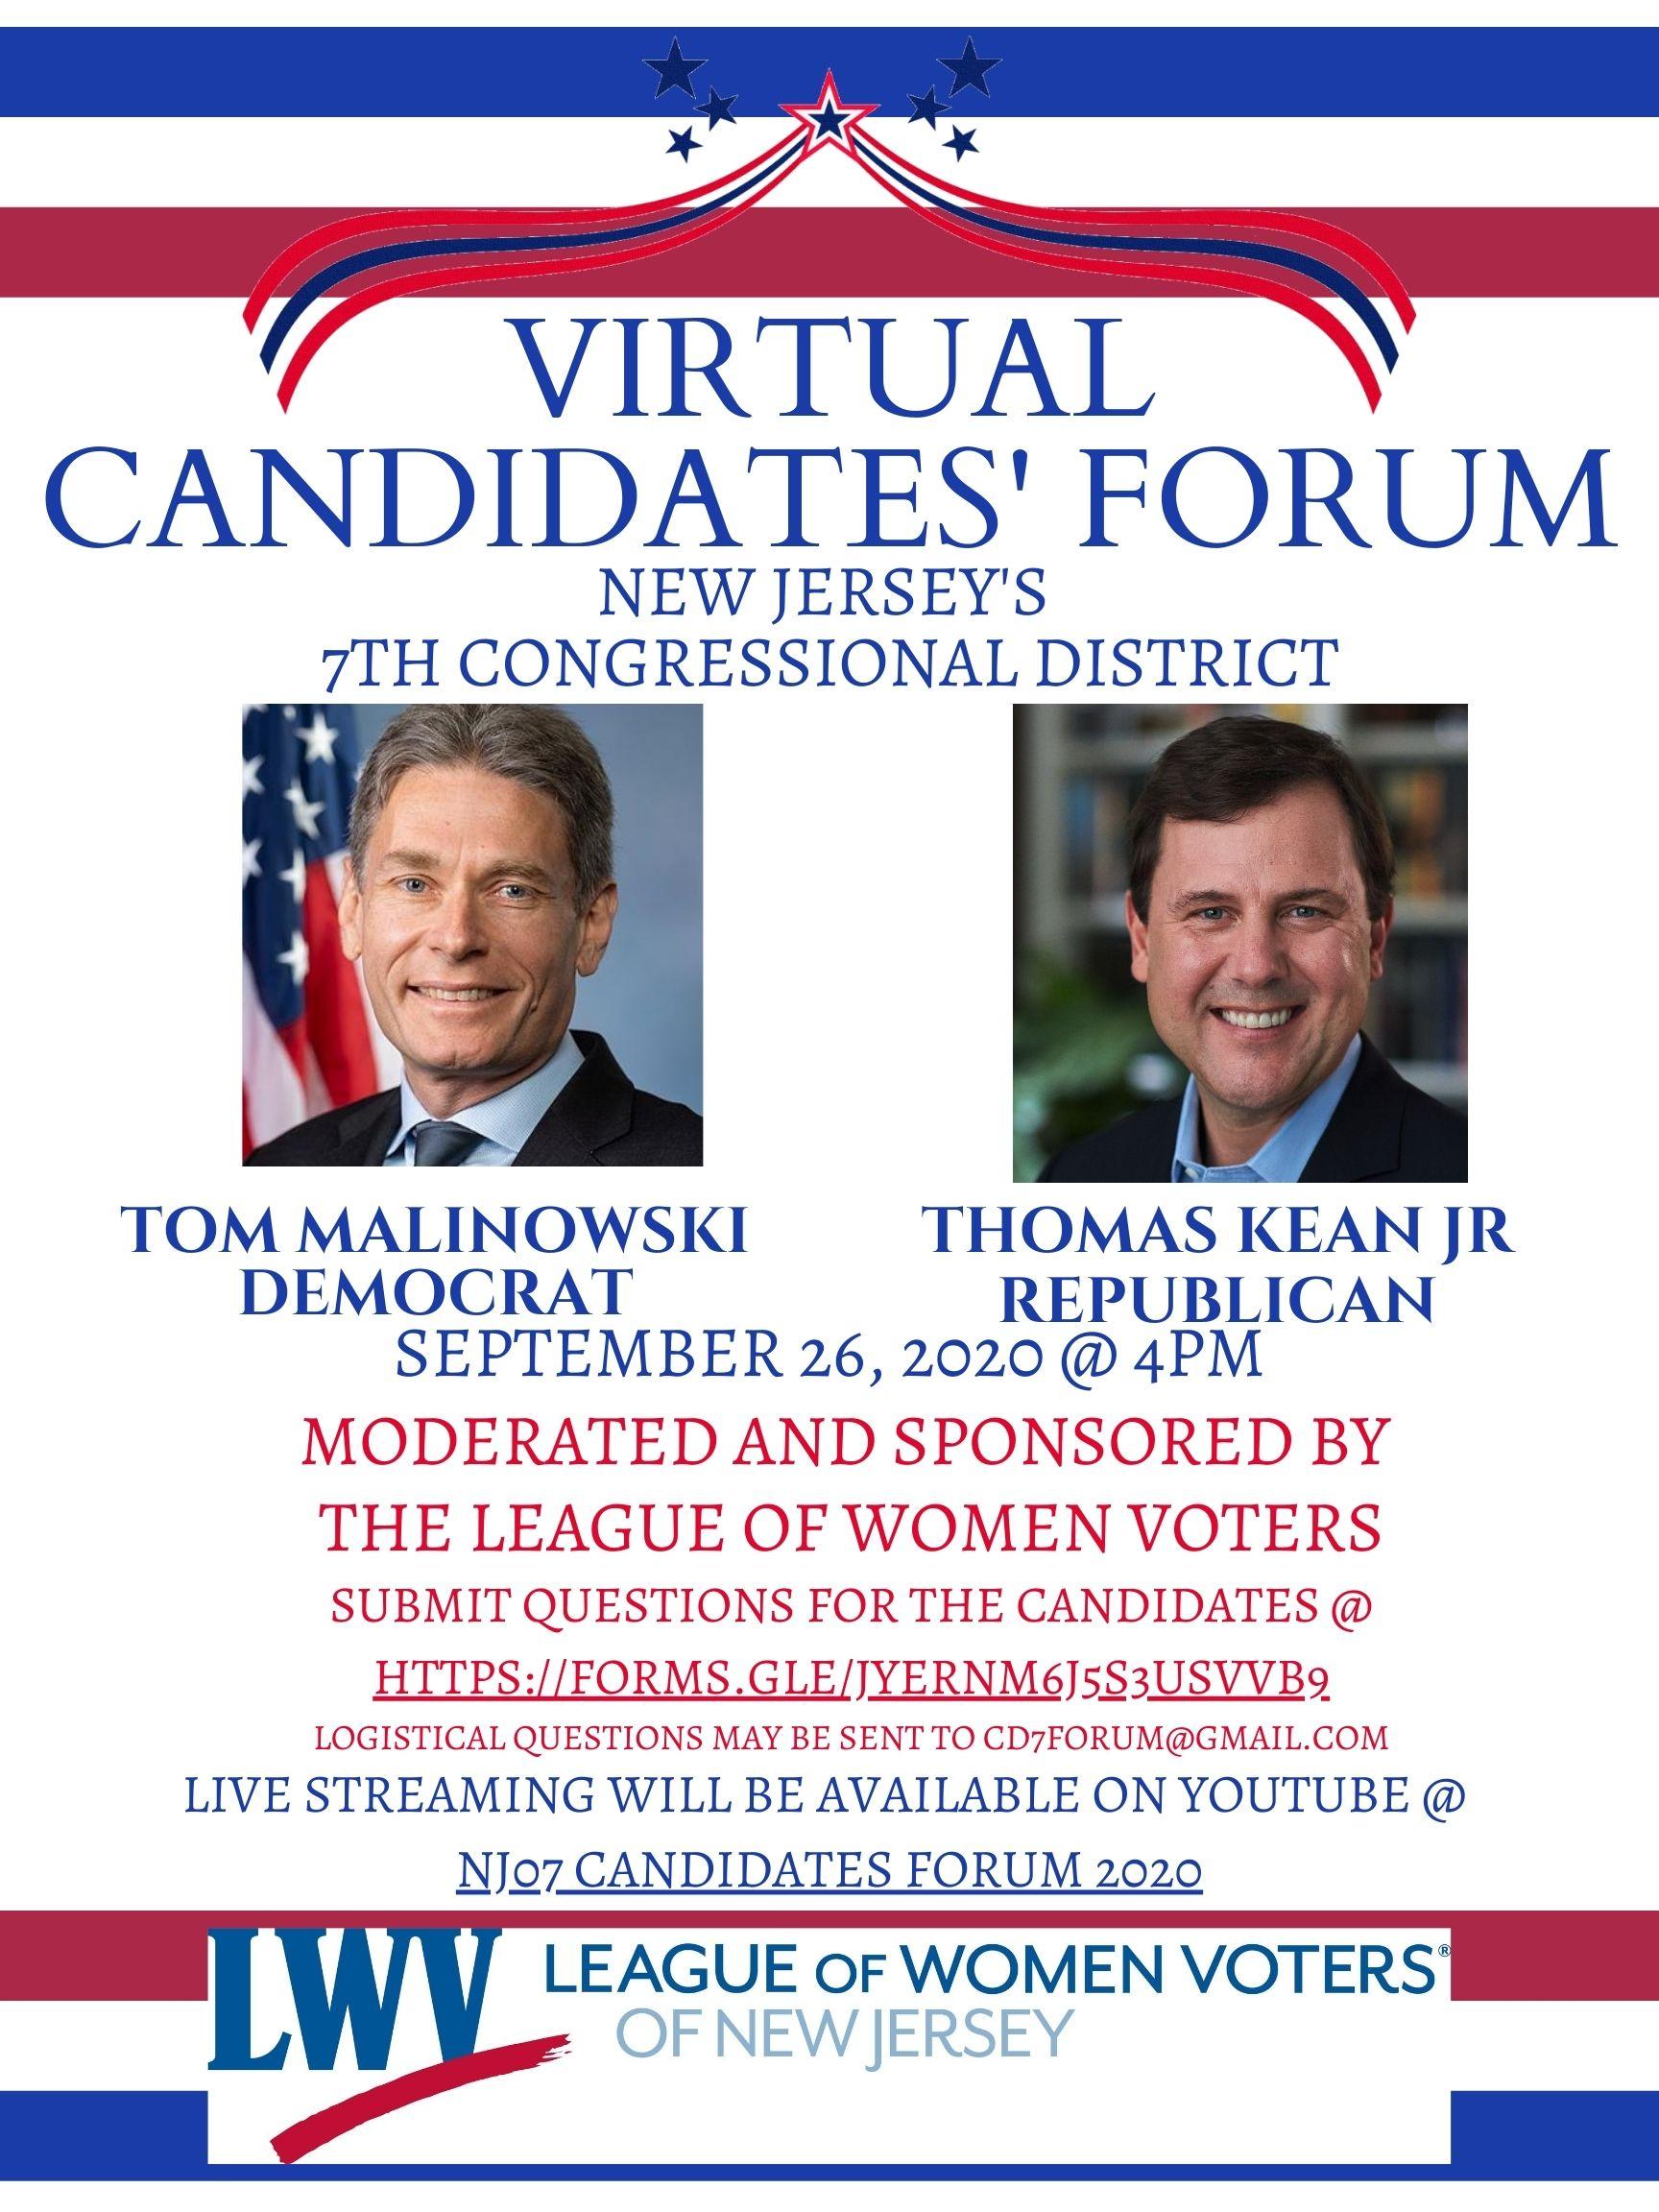 NJ7 Candidate Forum V4 pic.jpg